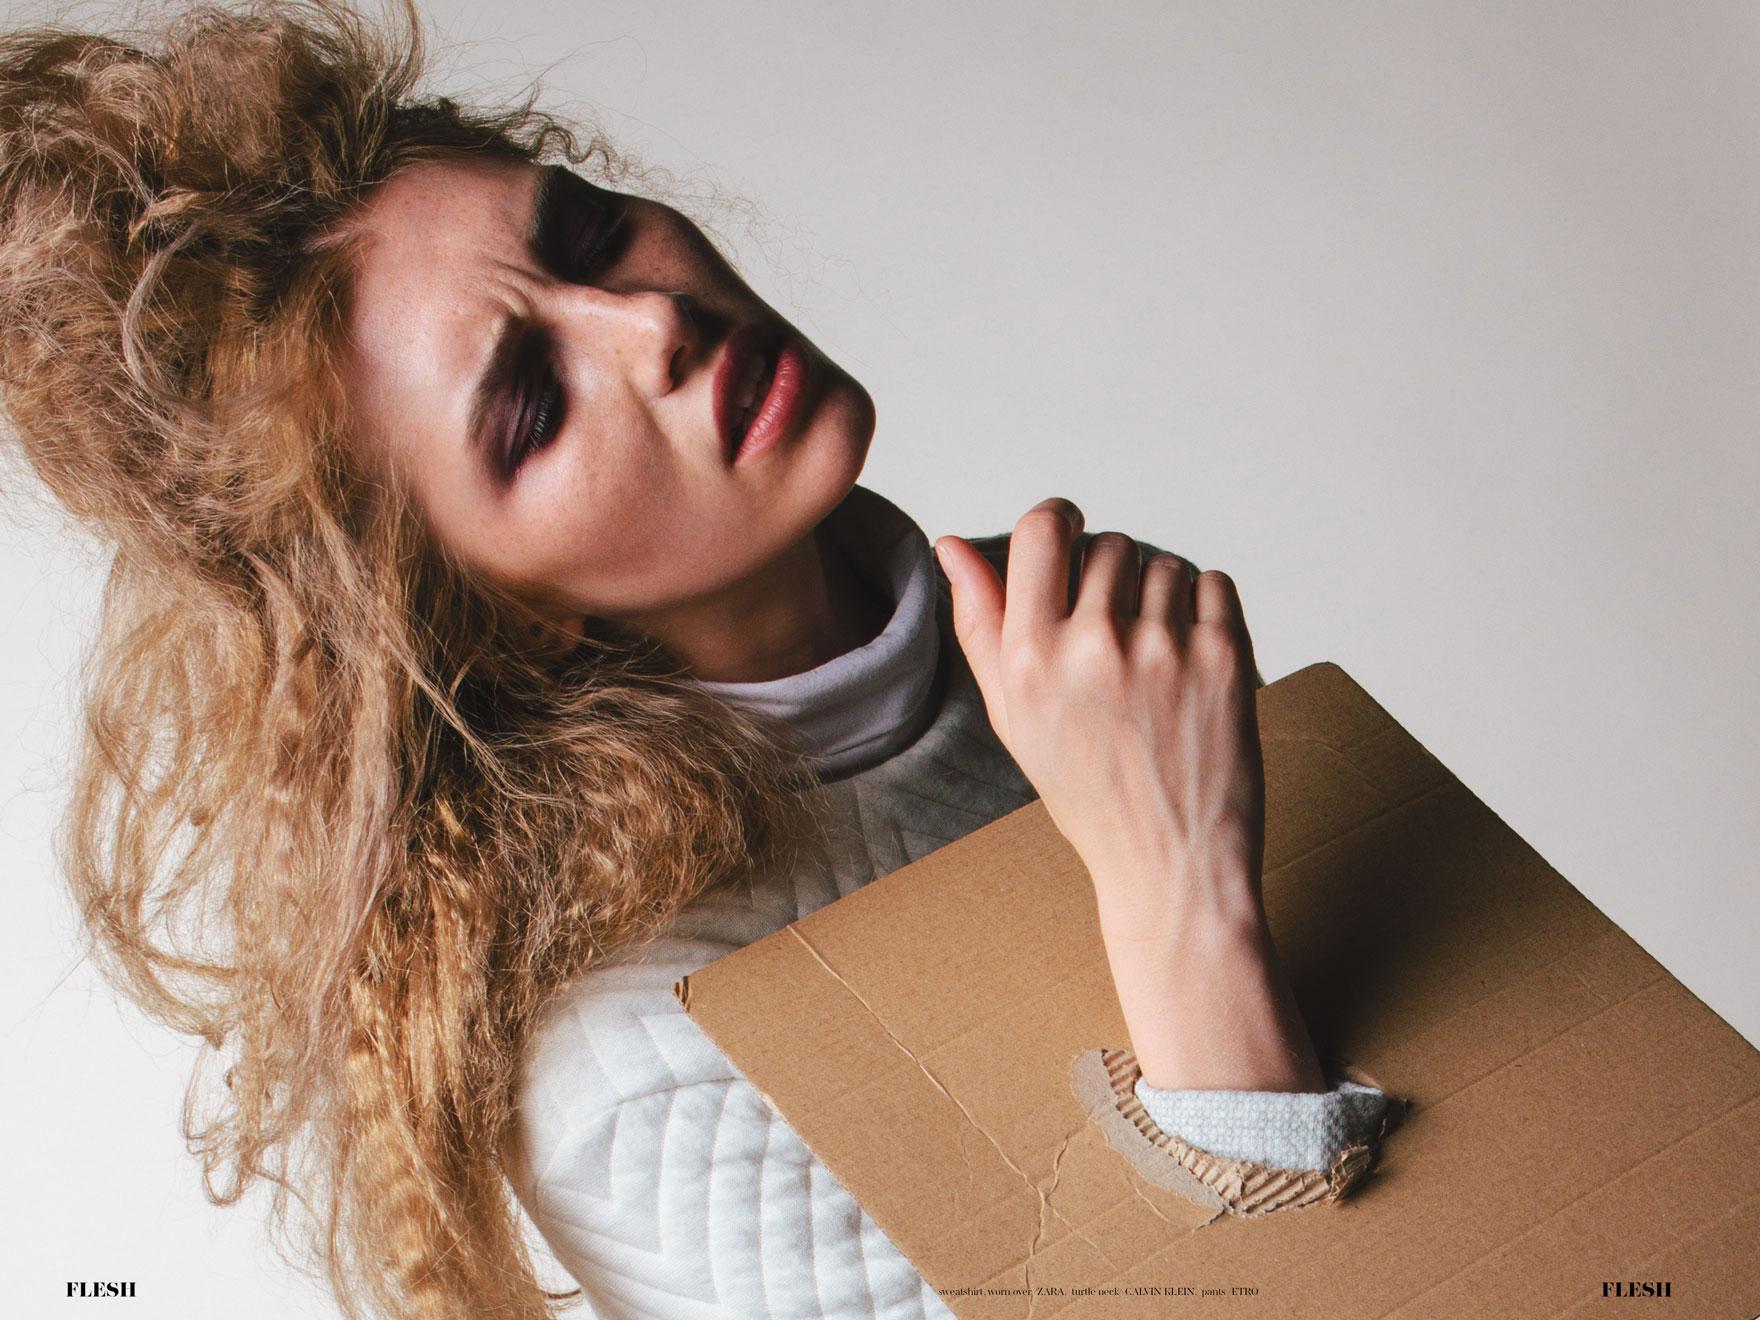 Hiding Behind Cardboard